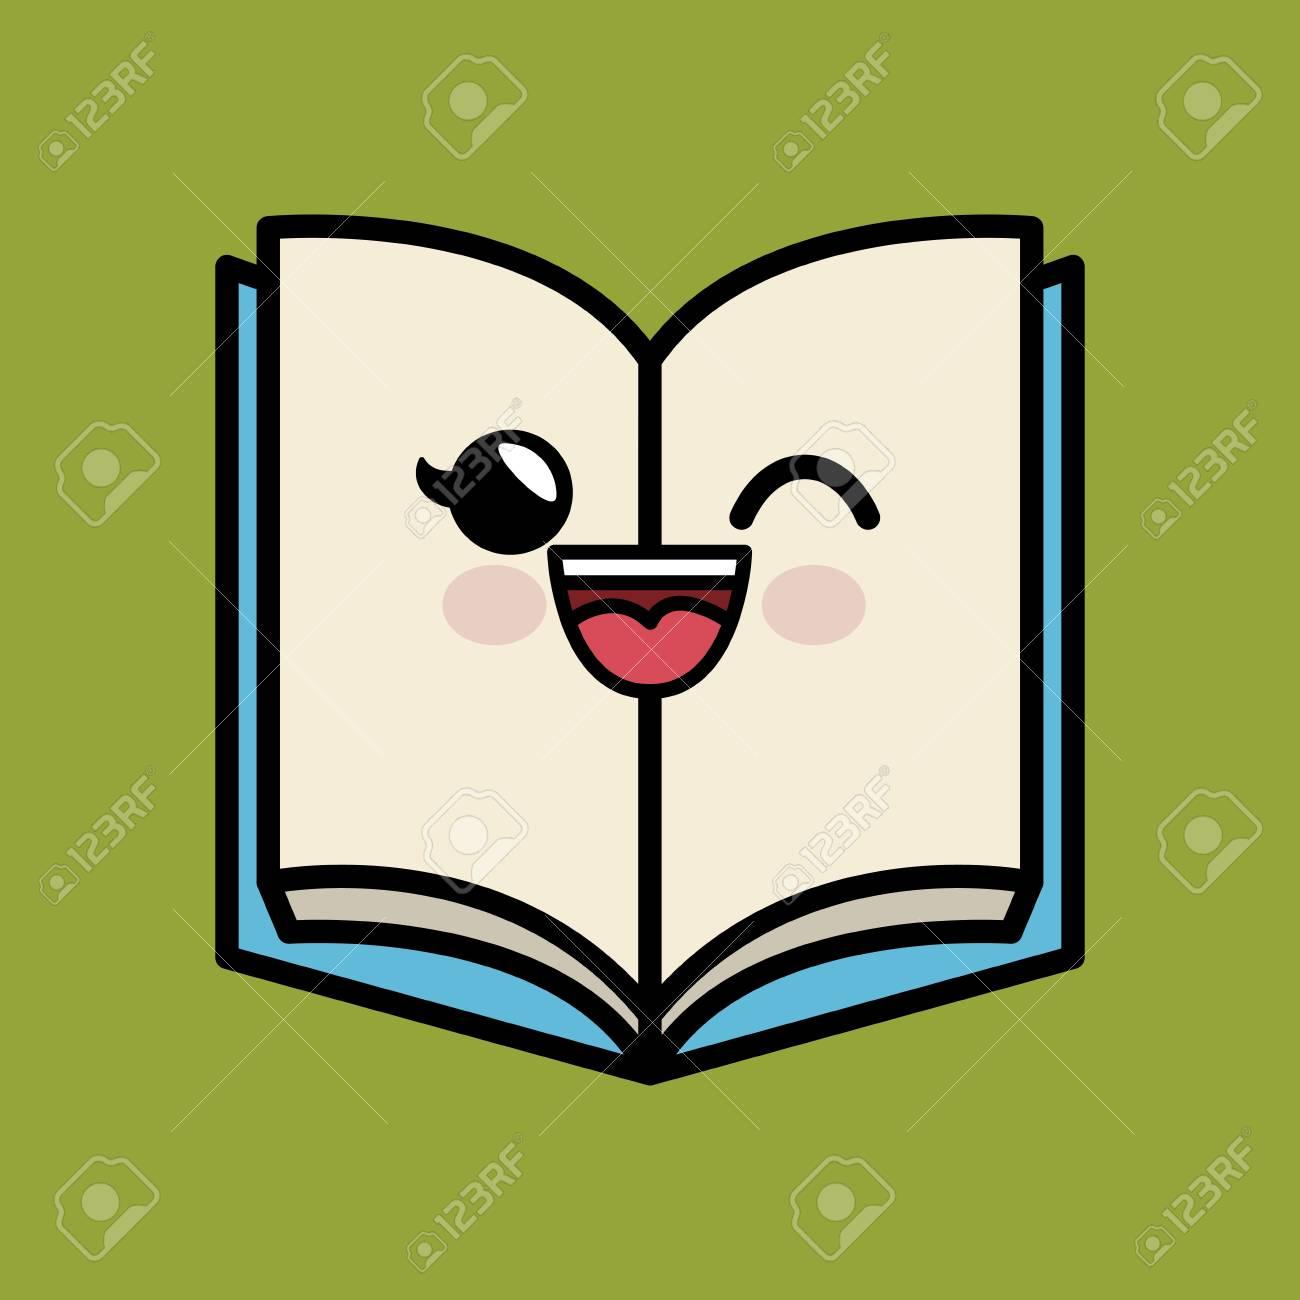 Caractere De Livre De Texte A La Main Dessin Illustration De Vecteur De Dessin